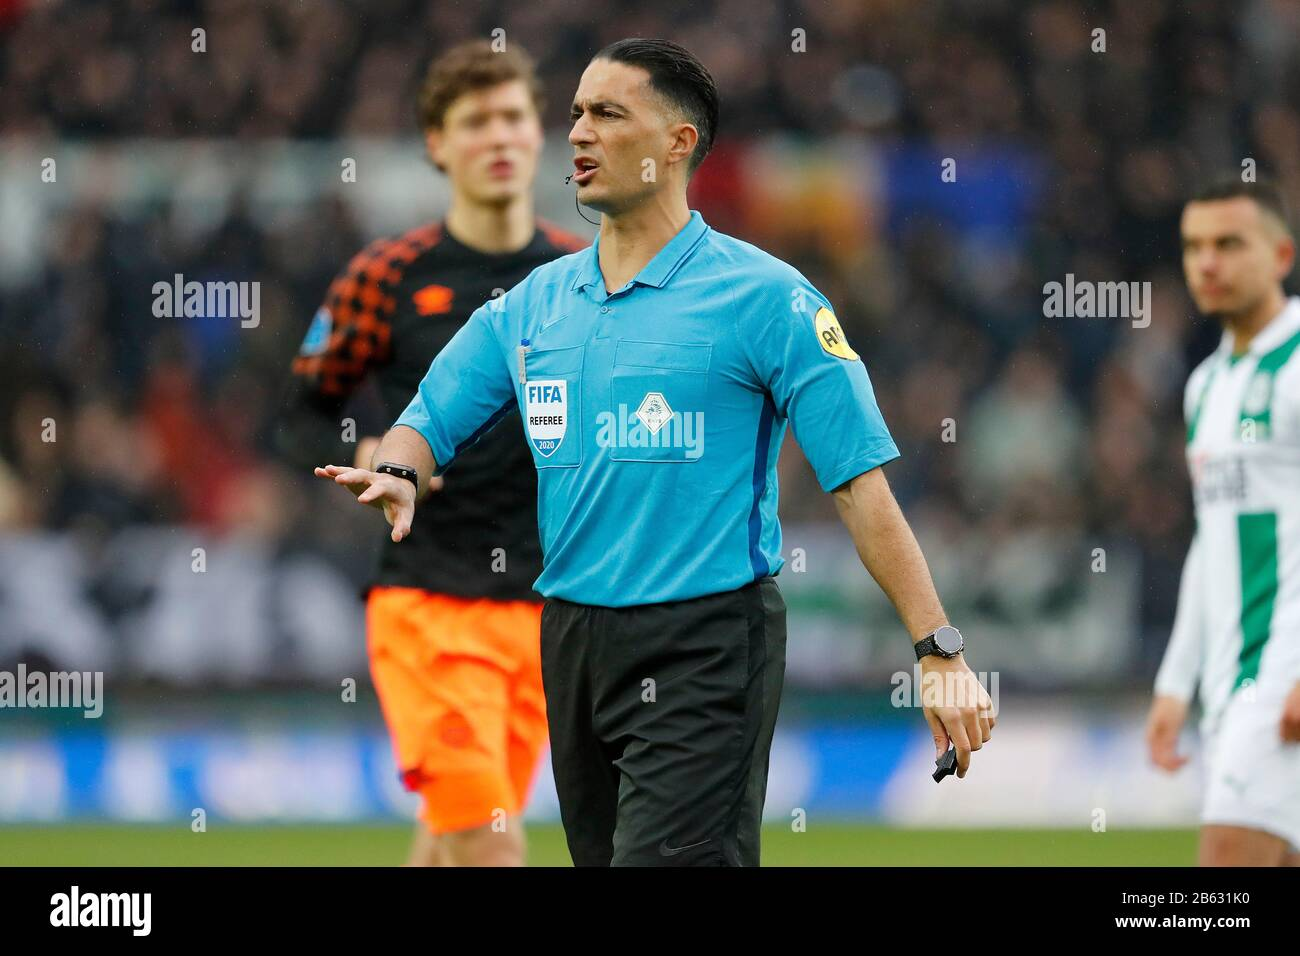 Match coronó 2019 2020 19 20 14-jeffrey gouweleeuw